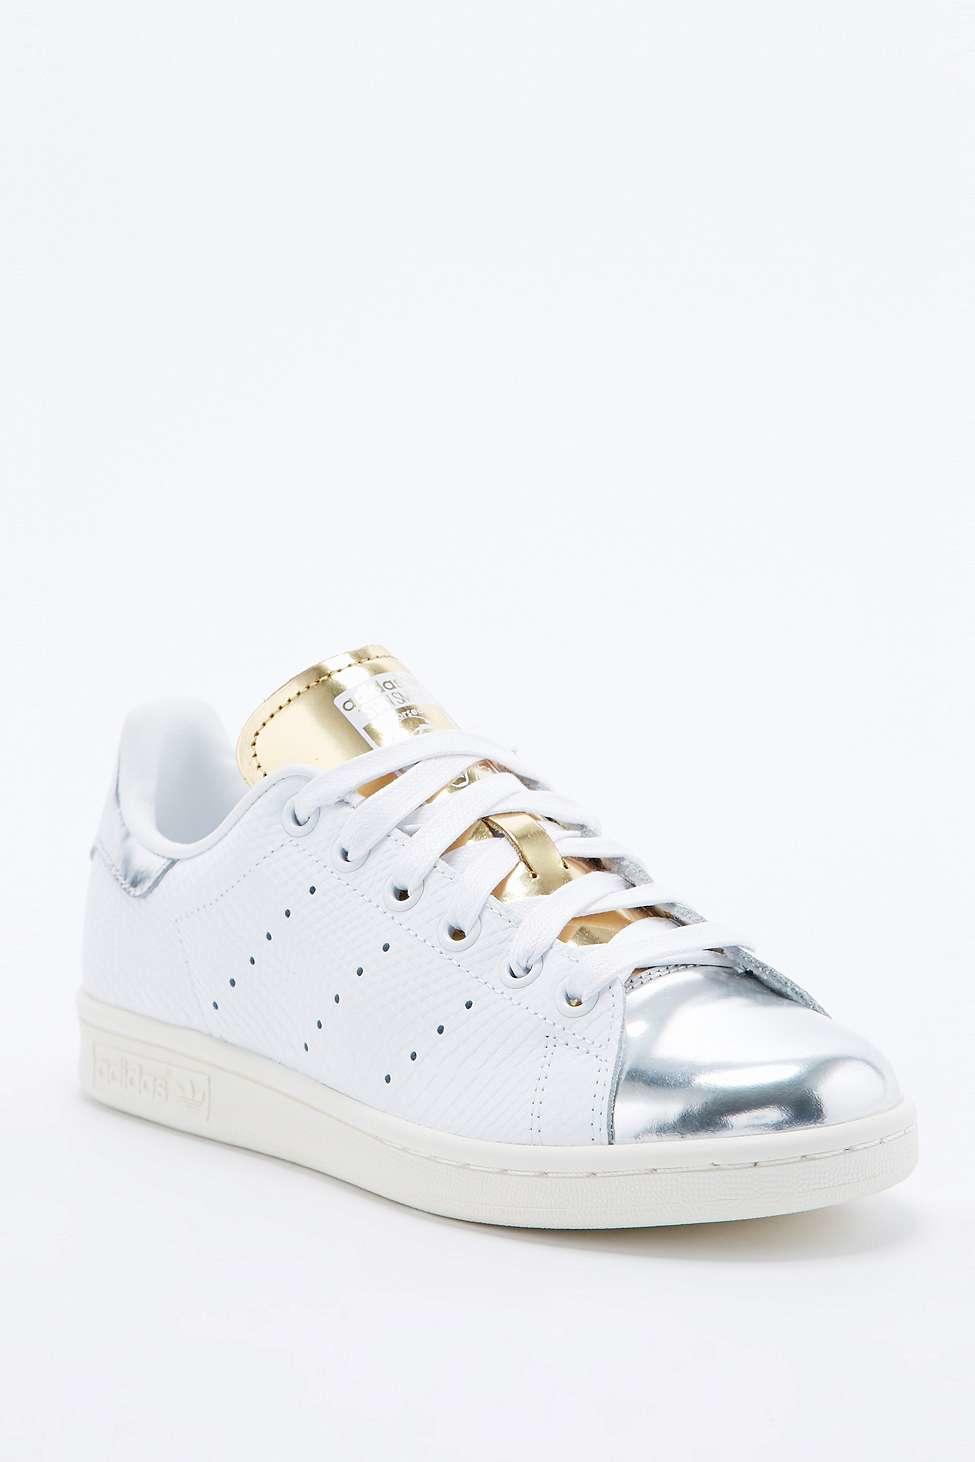 best website 76b41 54309 Adidas Stan Smith White Gold Silver